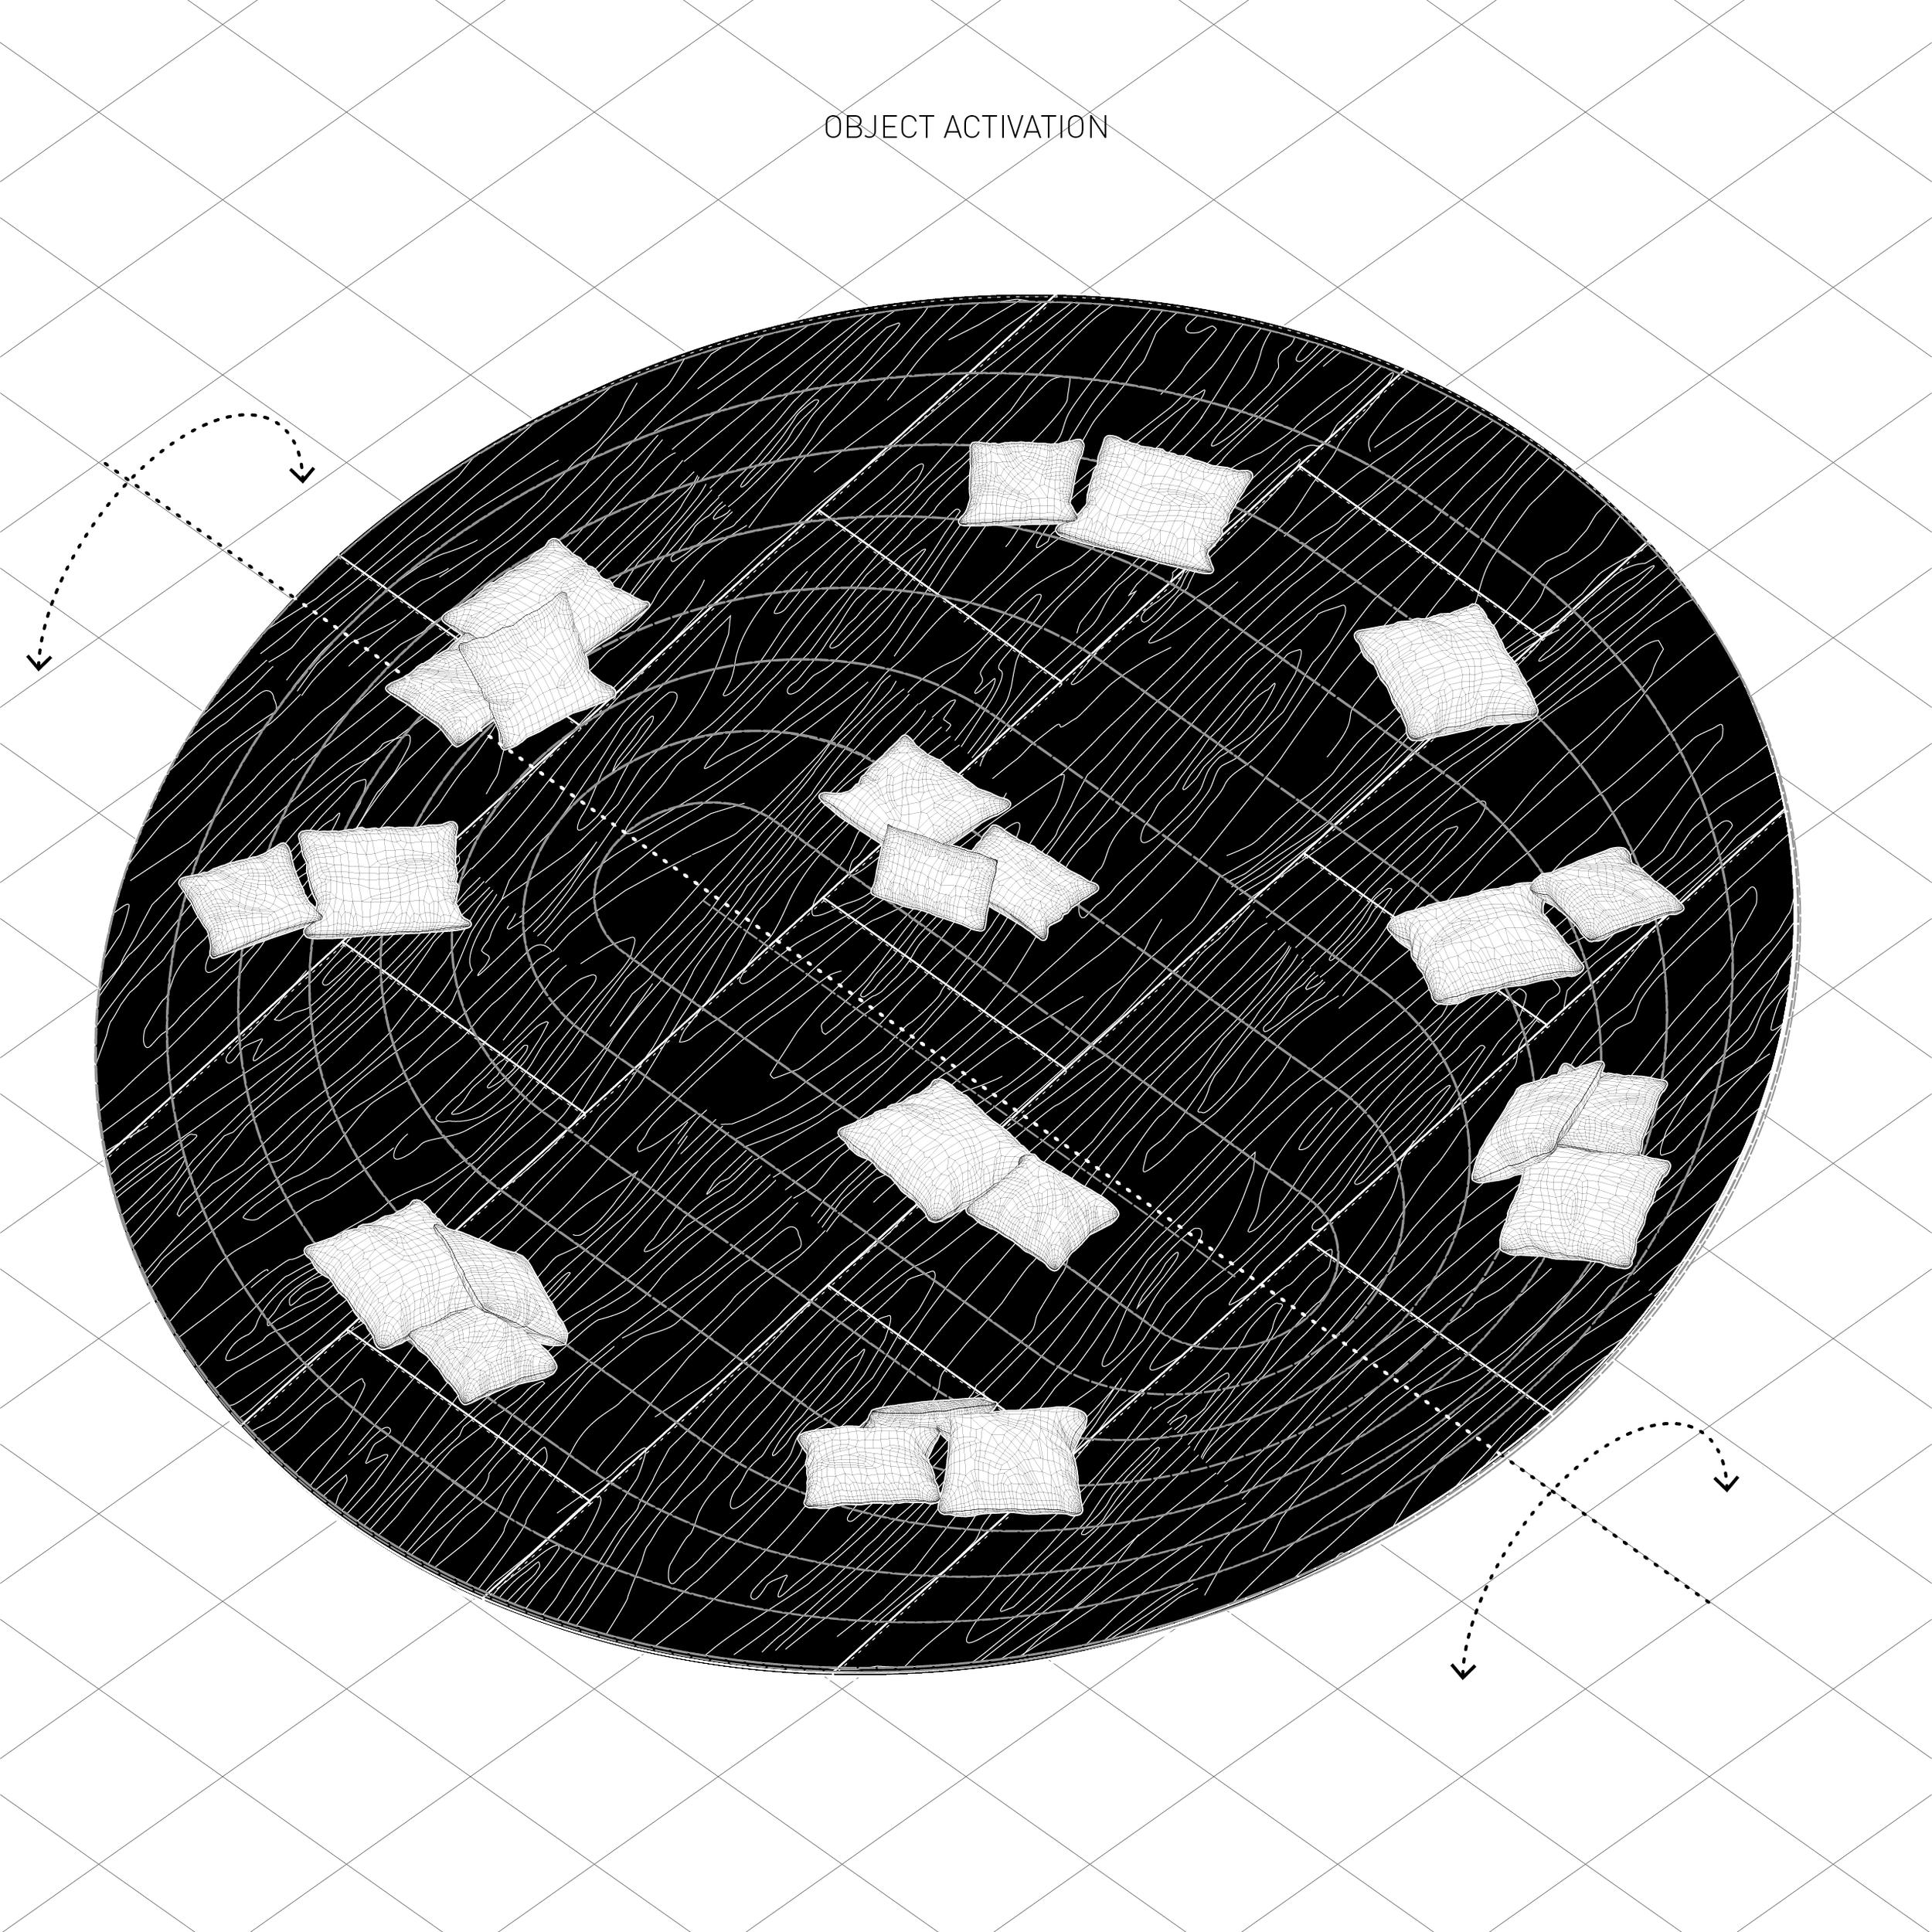 2019_Ragdale Ring_Web Material12.png